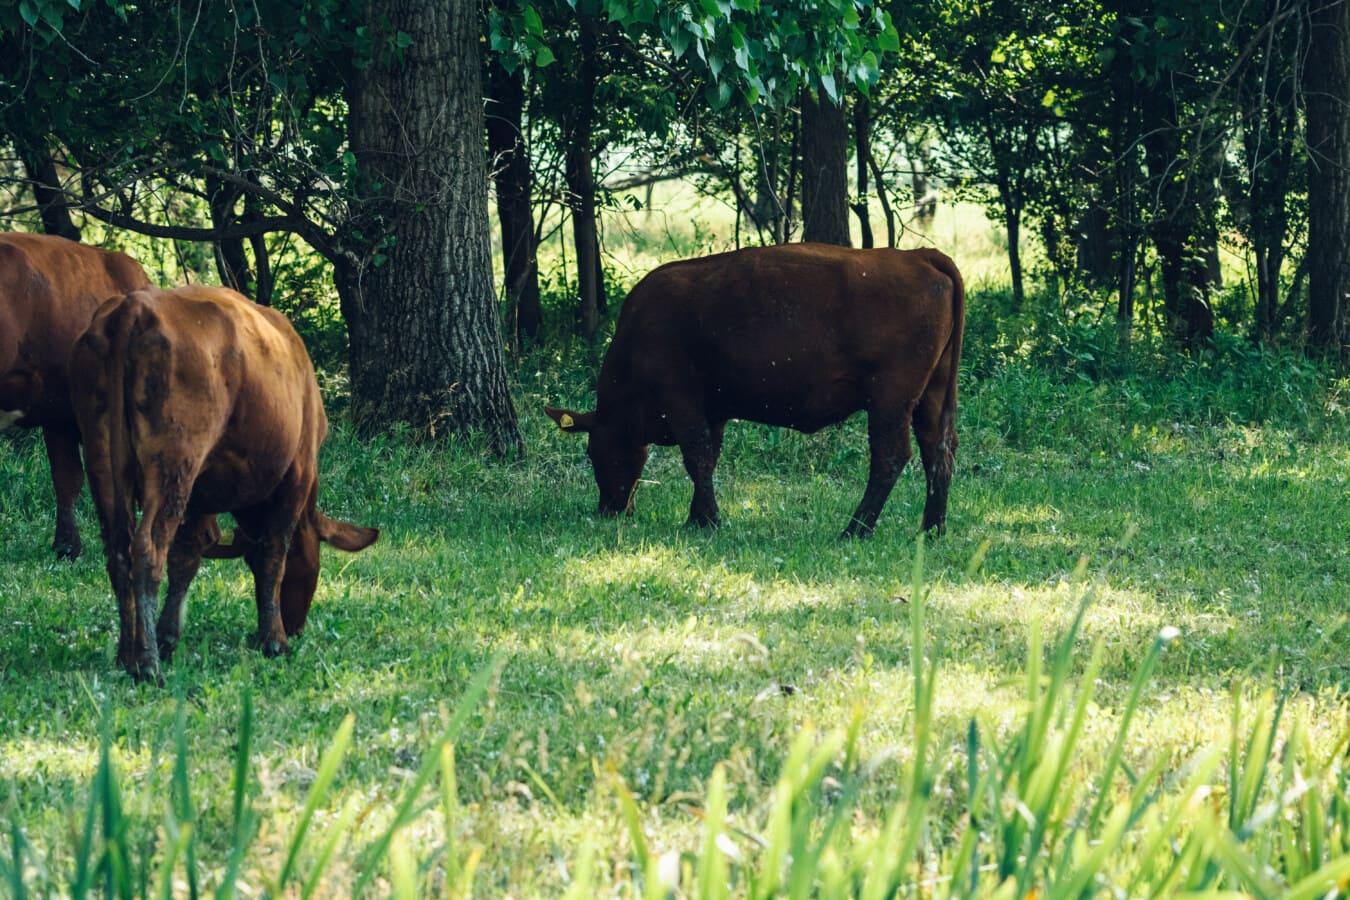 brun, Bull, pâturage, les terres agricoles, herbe, chevaux, domaine, bovins, prairie, vache